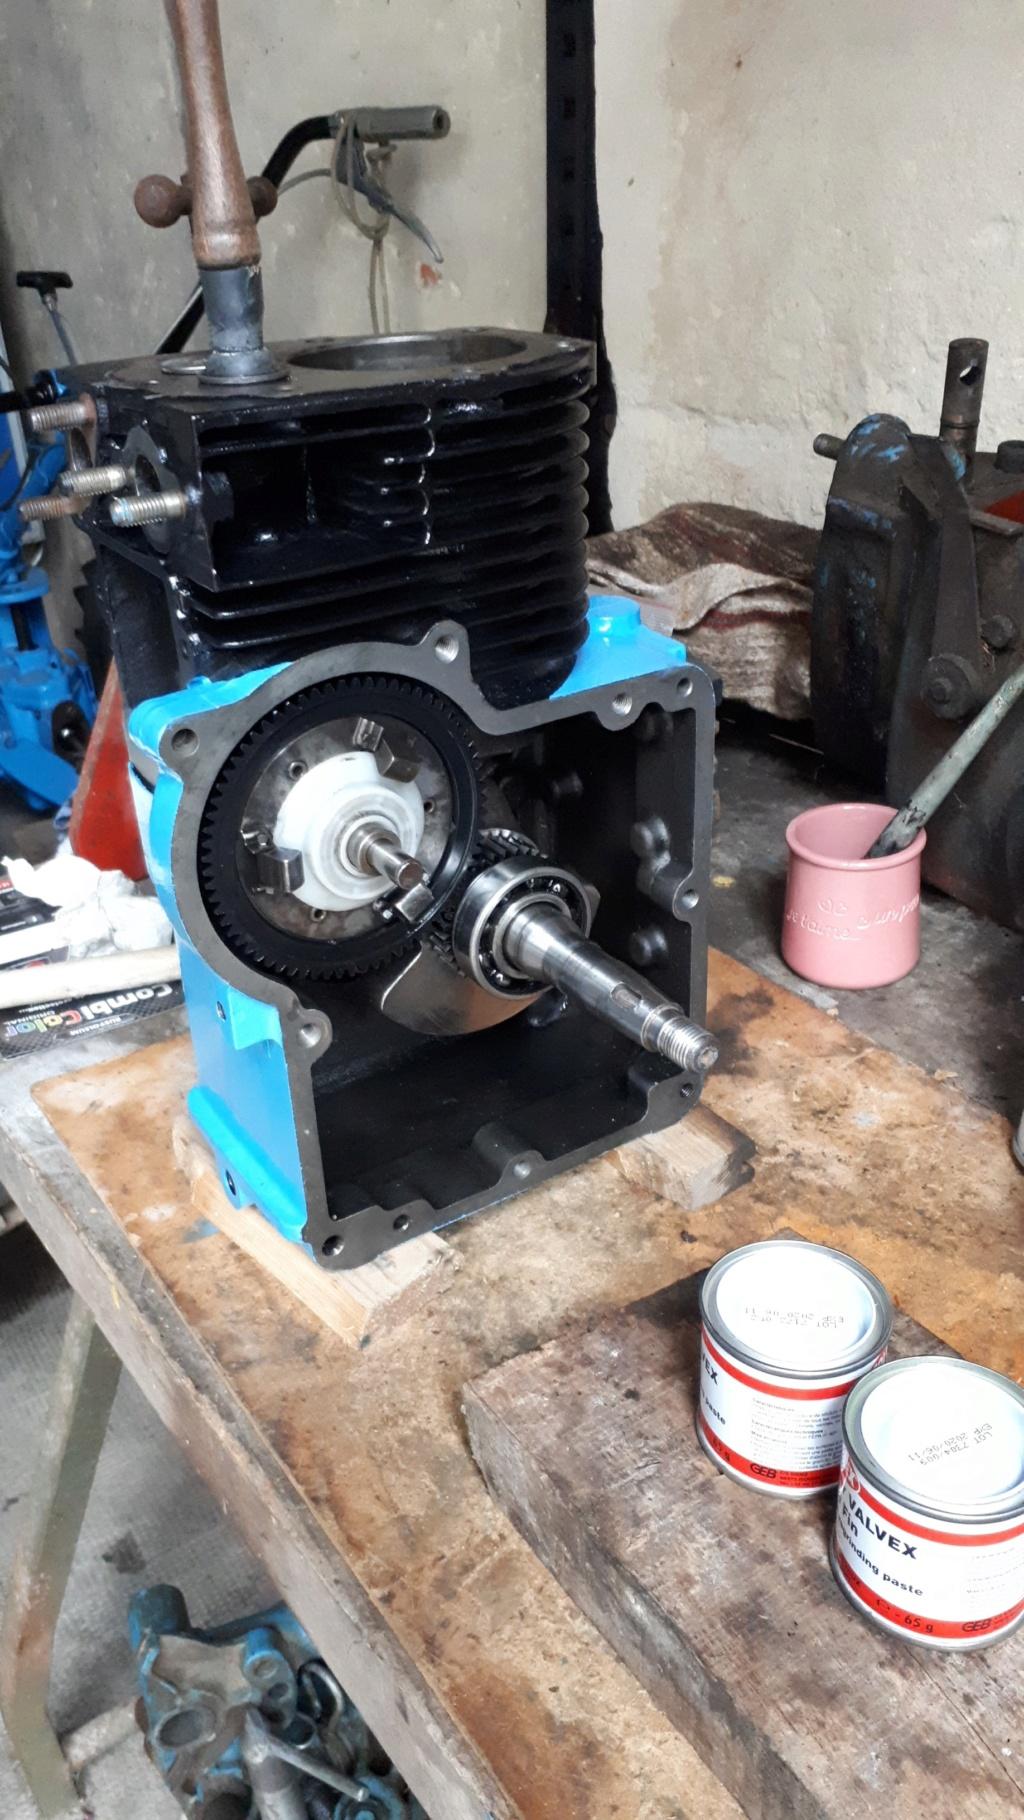 Pp2x - Rénovation Moteur MAG 1029 SRLX (PP2X SM) 20180918